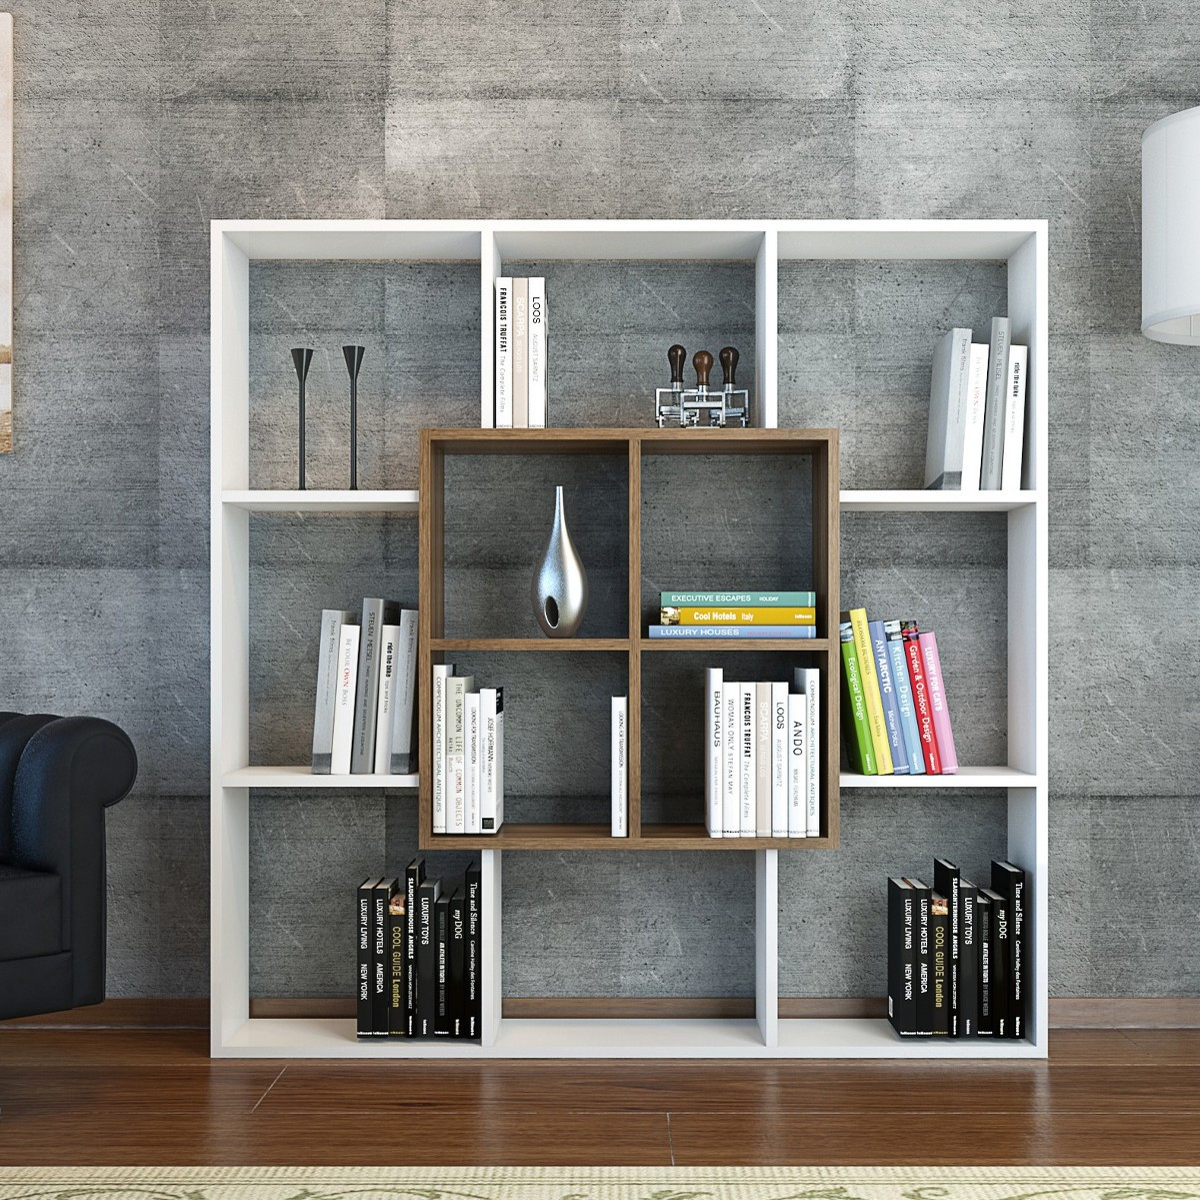 Laerke libreria da terra quadrata in legno 136 x 136 cm